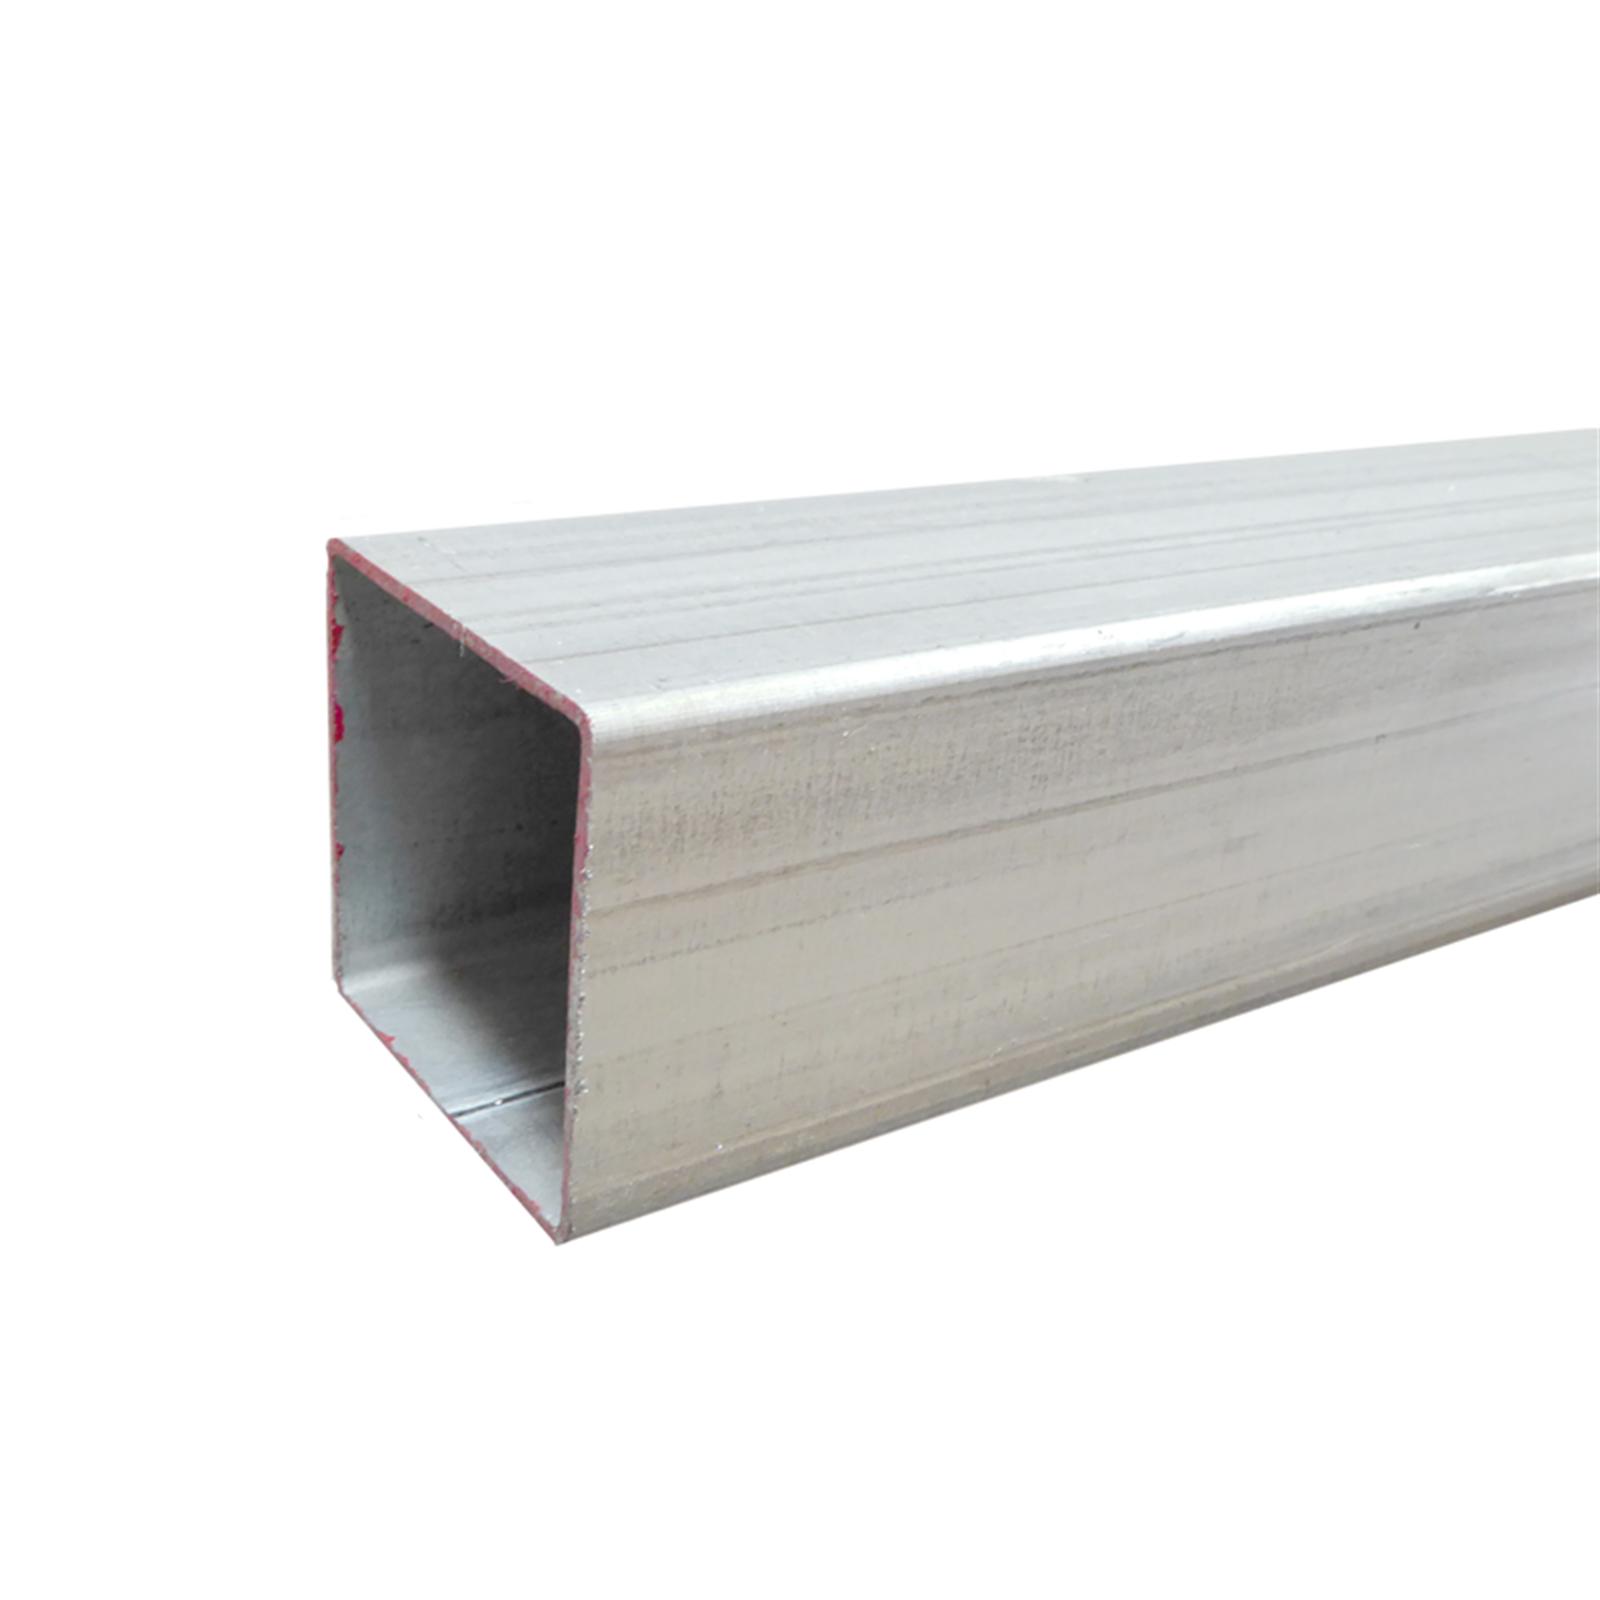 Australian Handyman Supplies Steel Fence Post 50 x 50mm x 2.4m Galvanised